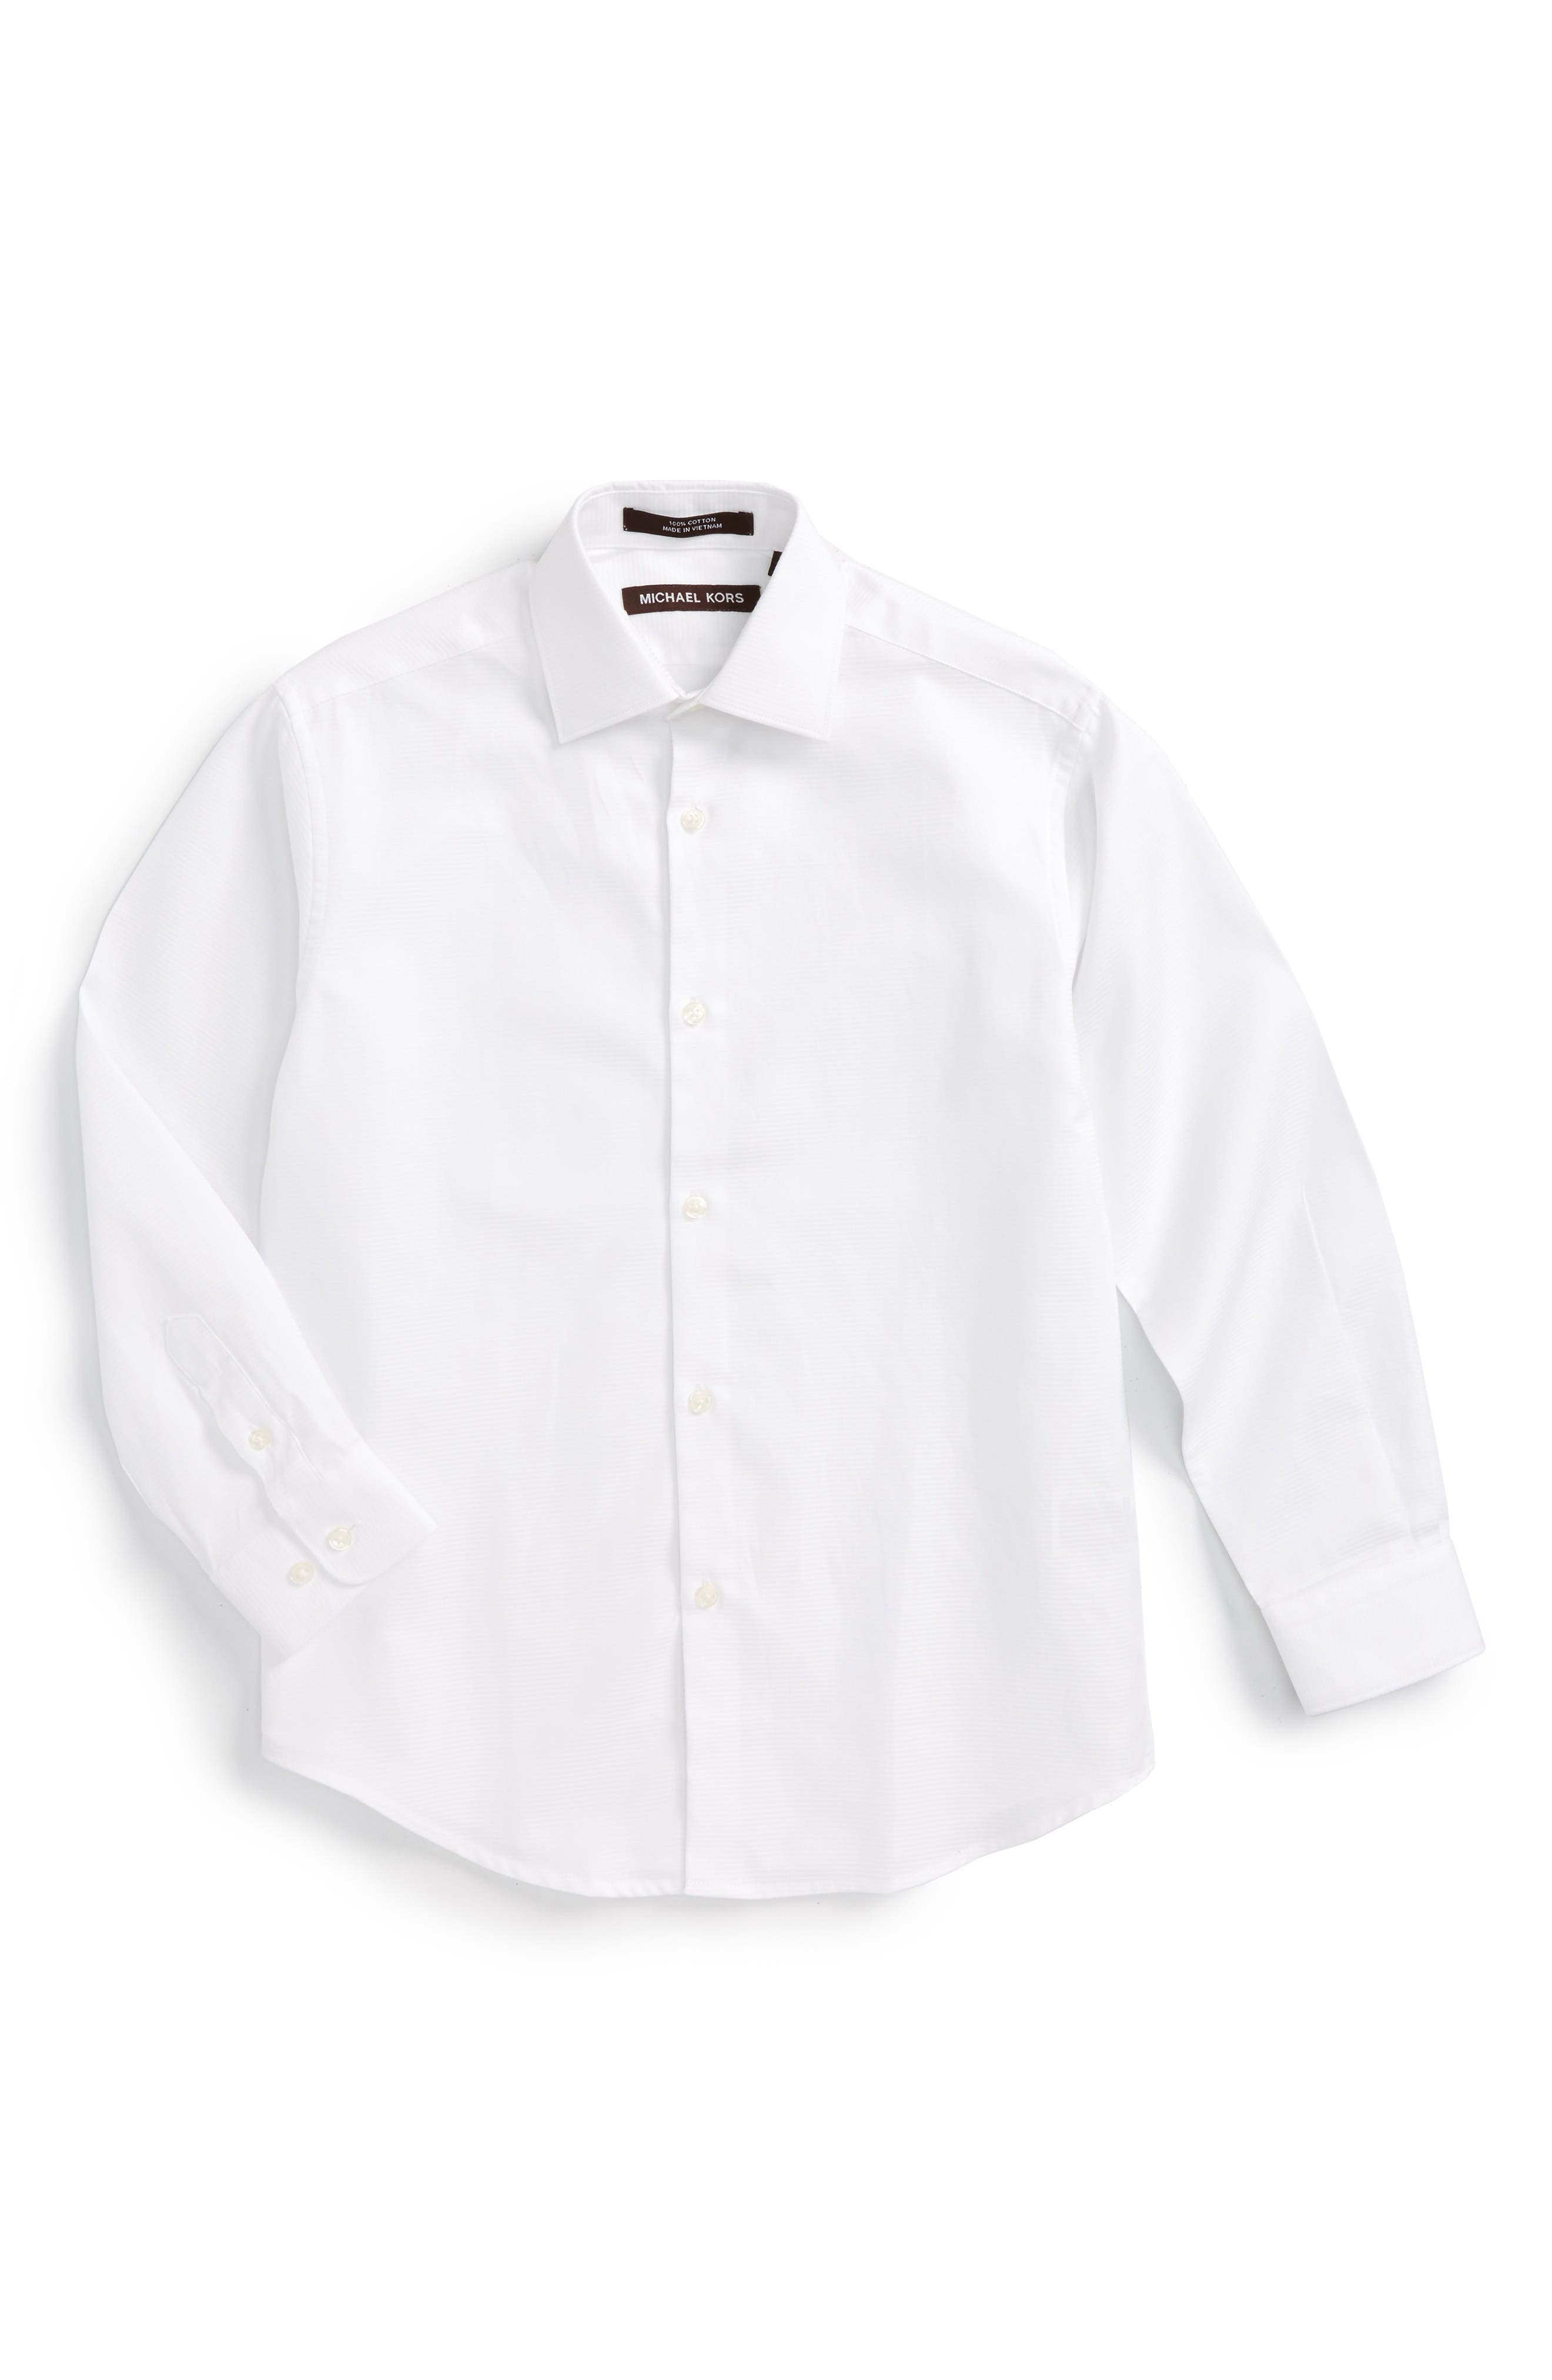 Solid Dress Shirt,                             Main thumbnail 1, color,                             White